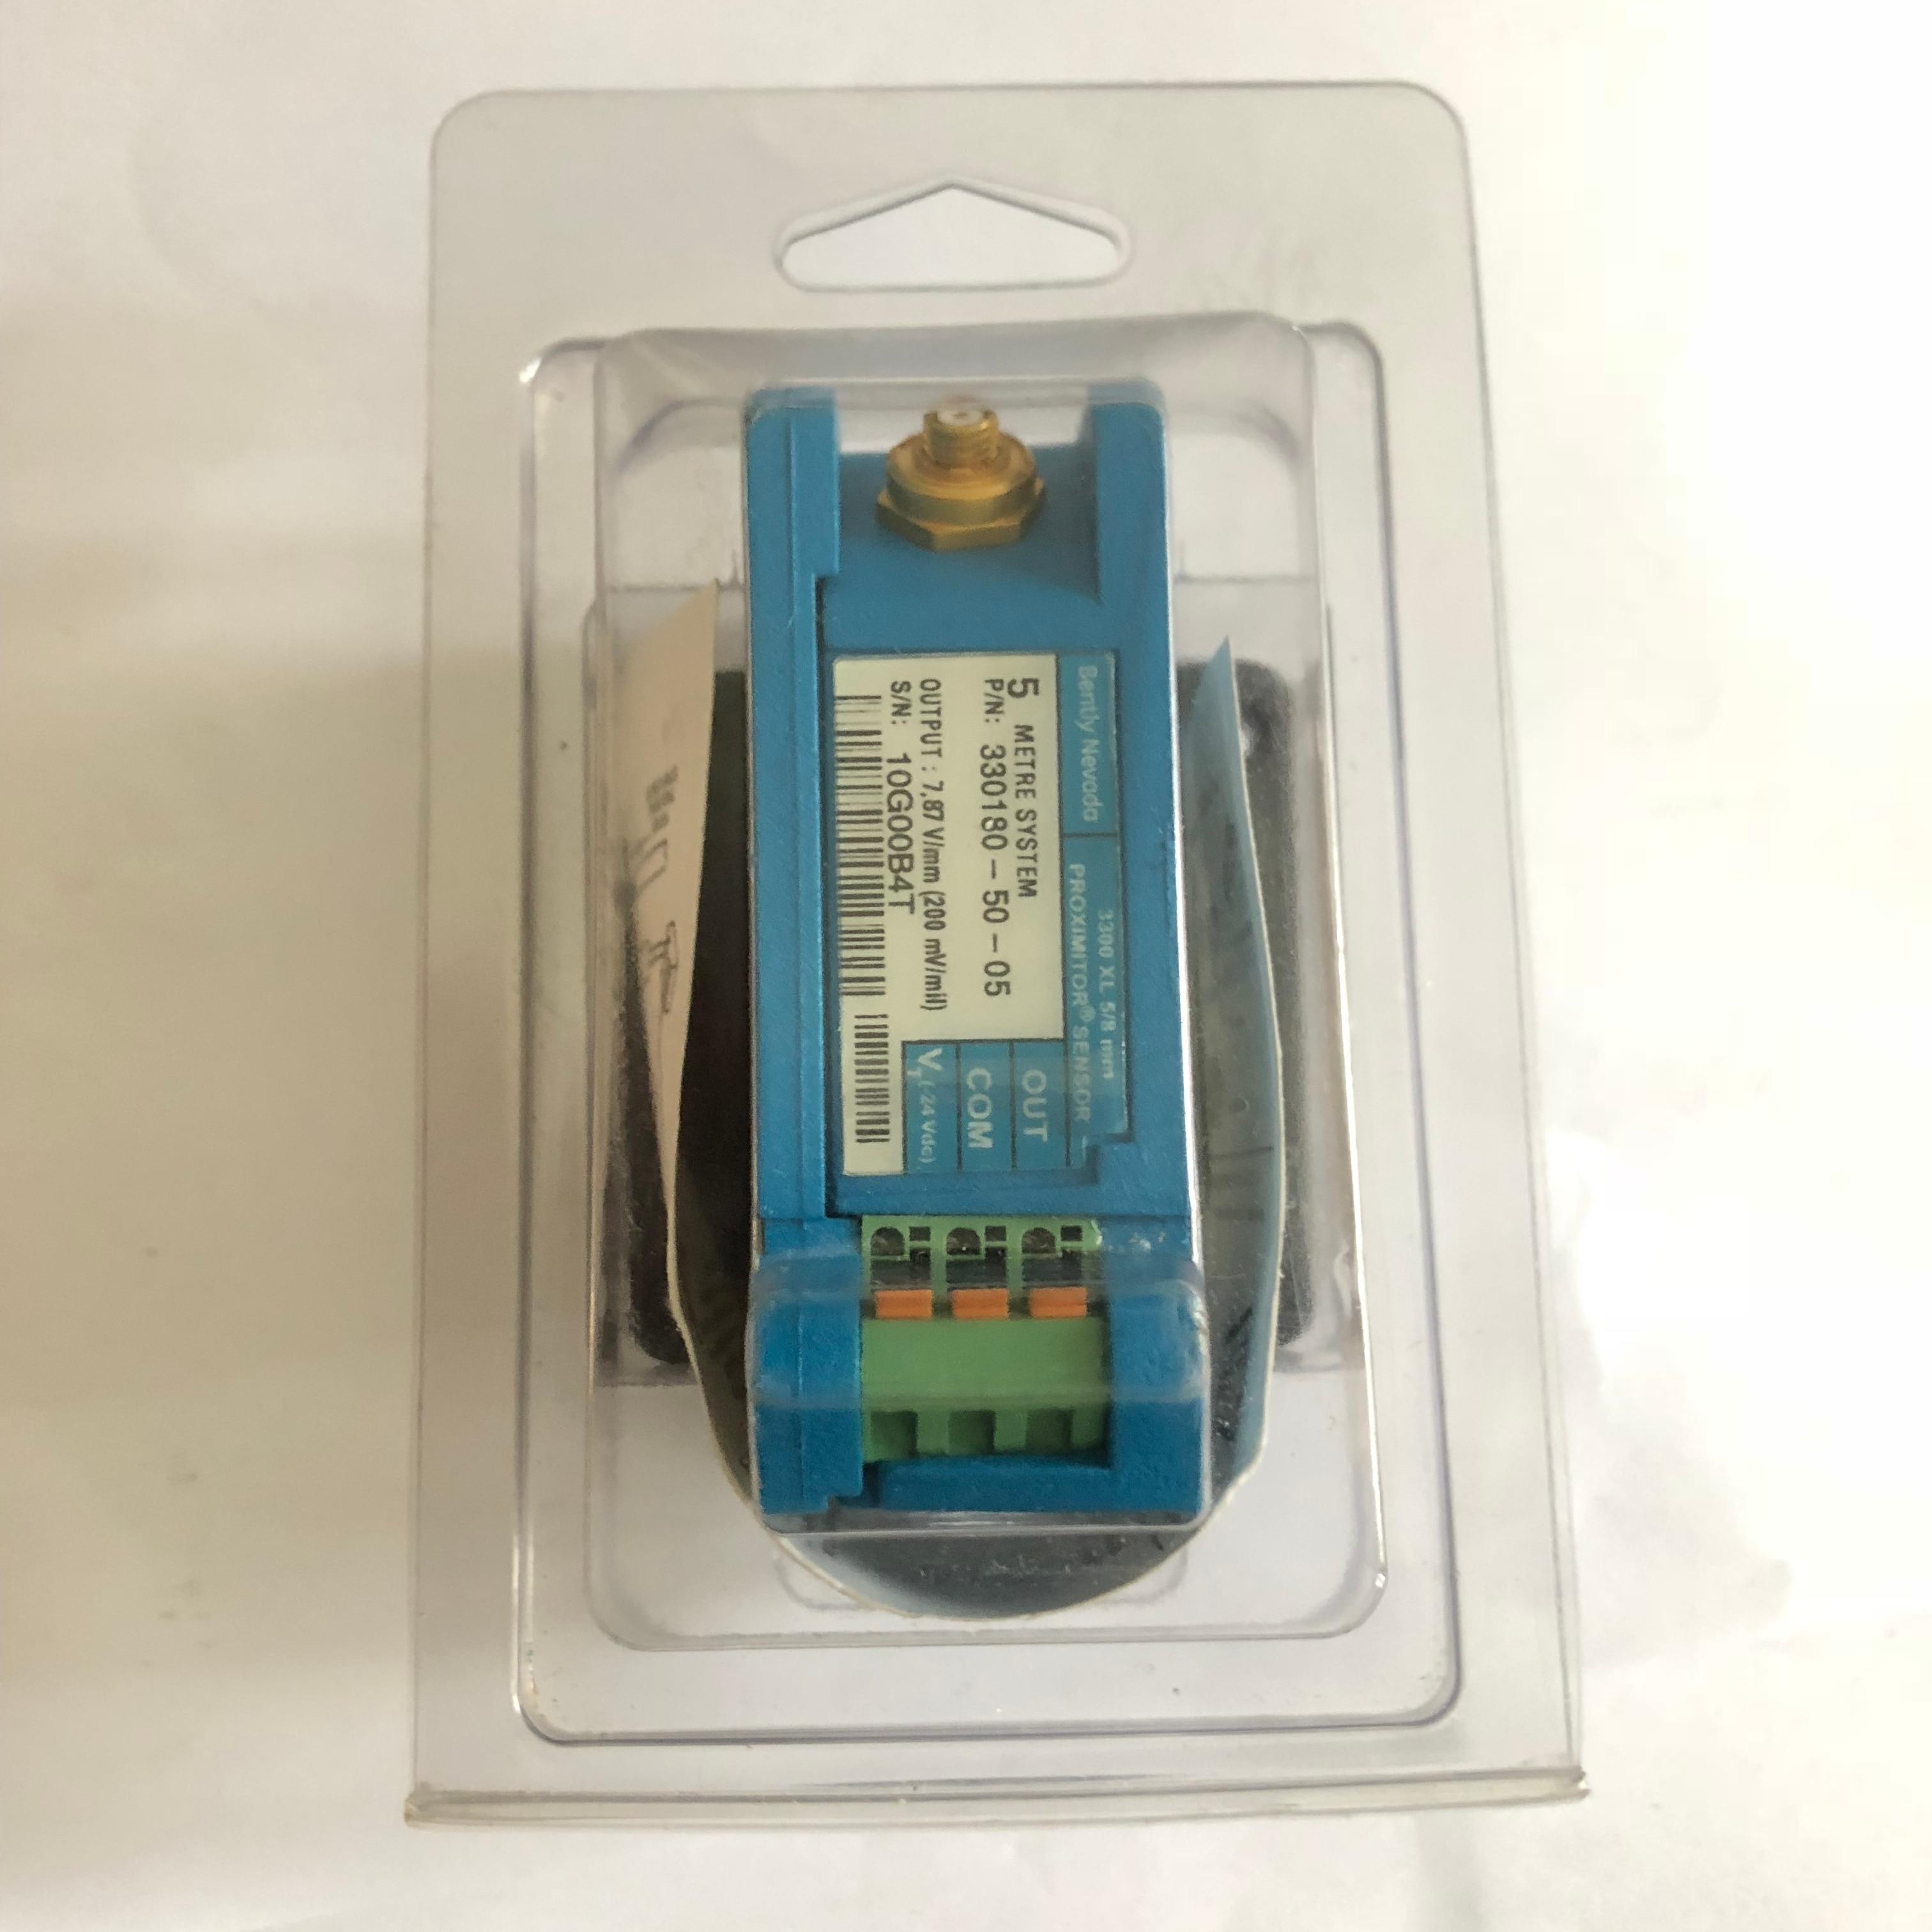 330850-90-05 3300 XL 22mm PROXIMITOR חיישן